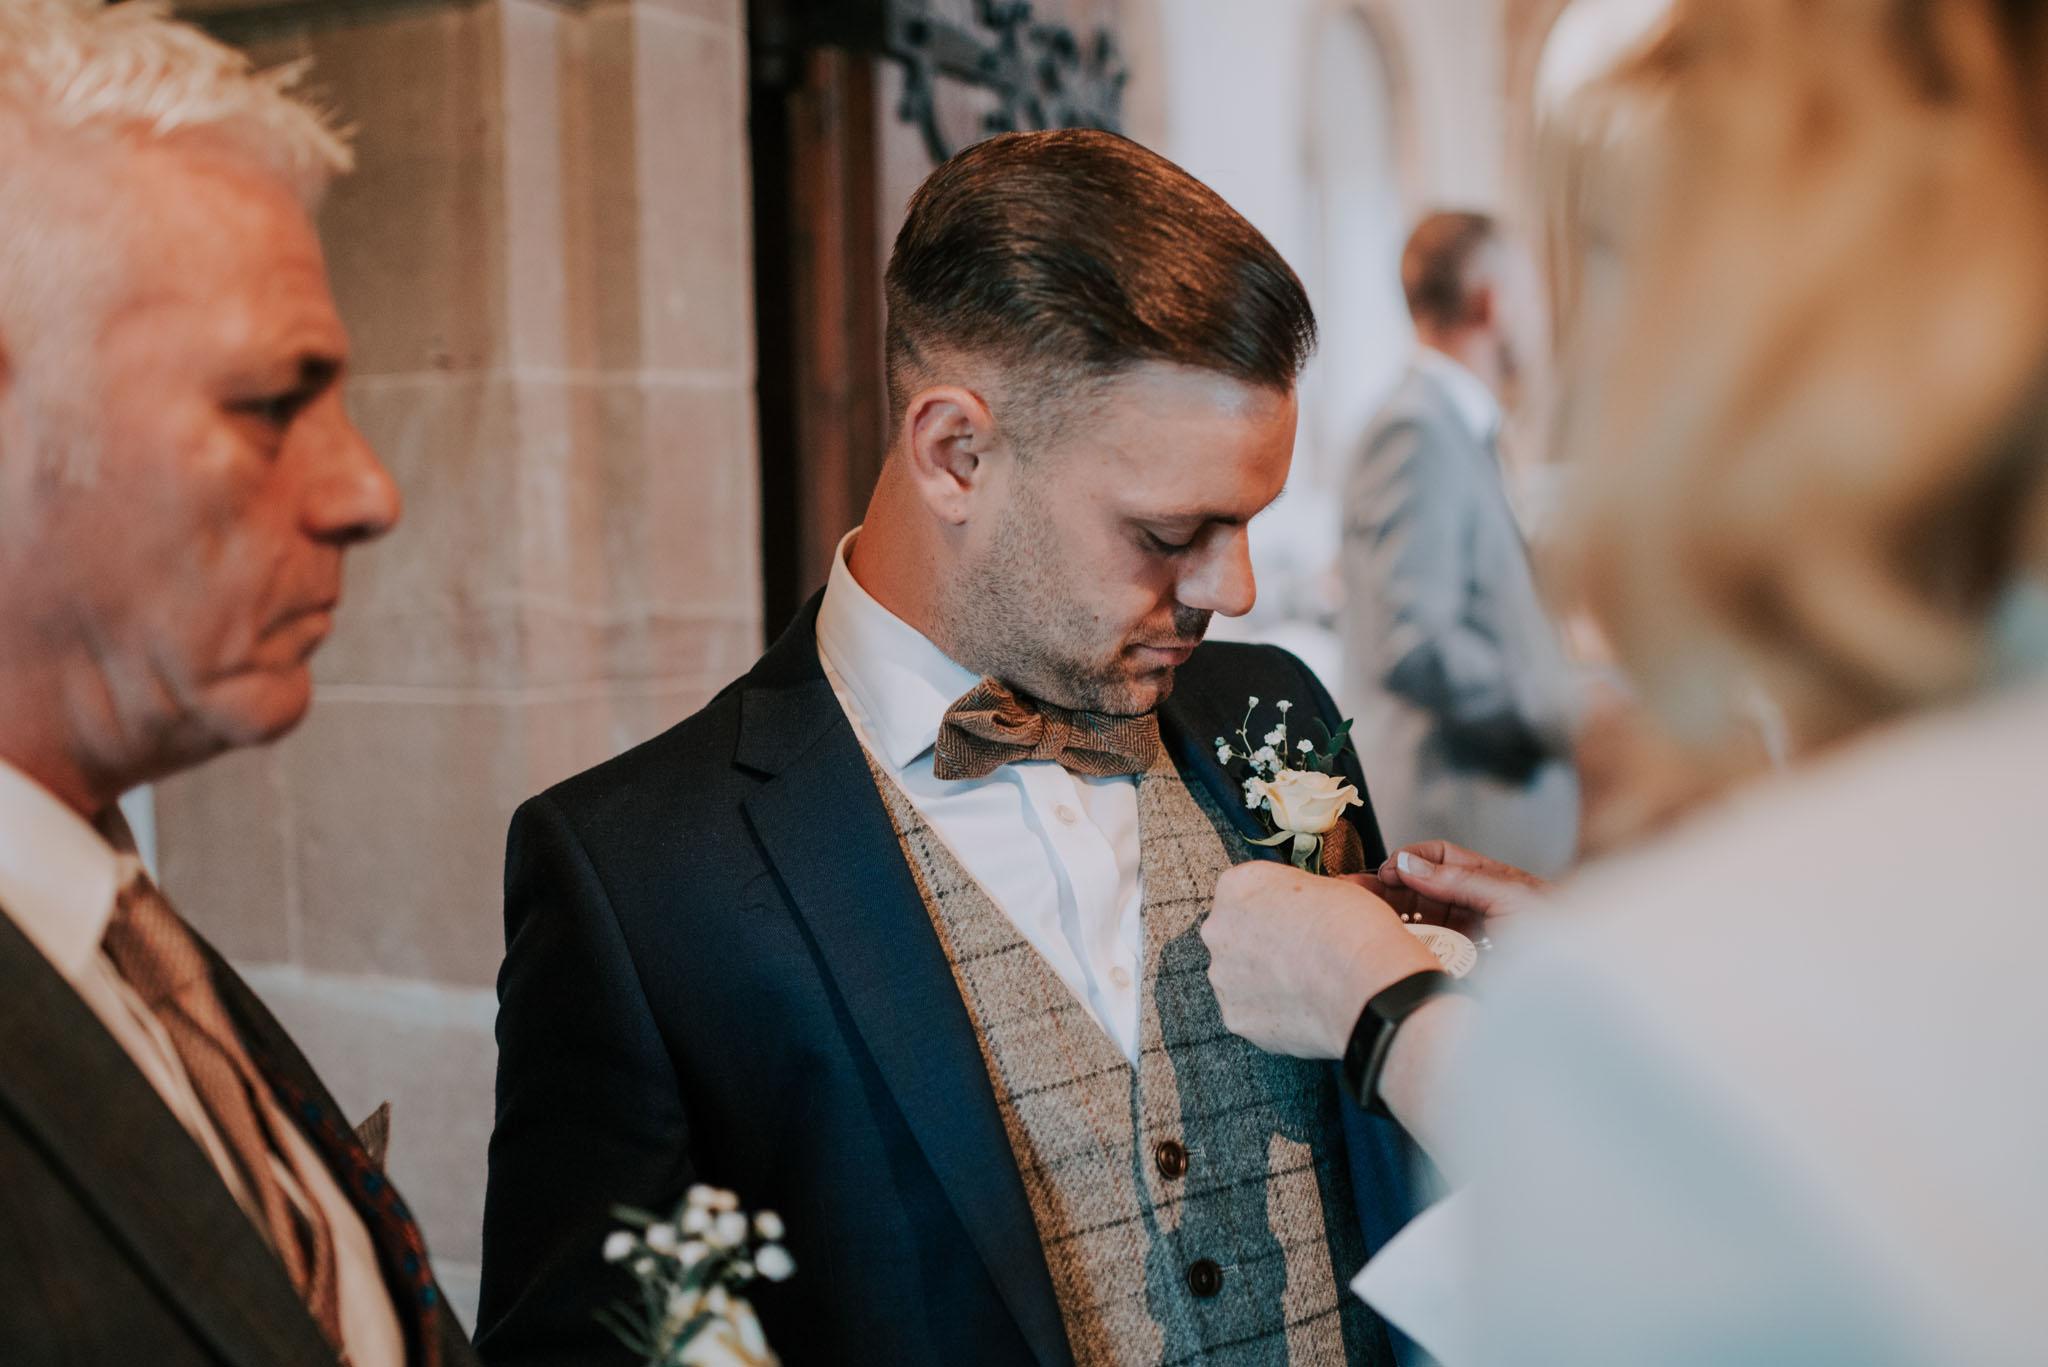 wedding-photographer-glewstone-court-hereford-scott-stockwell-photography124.jpg